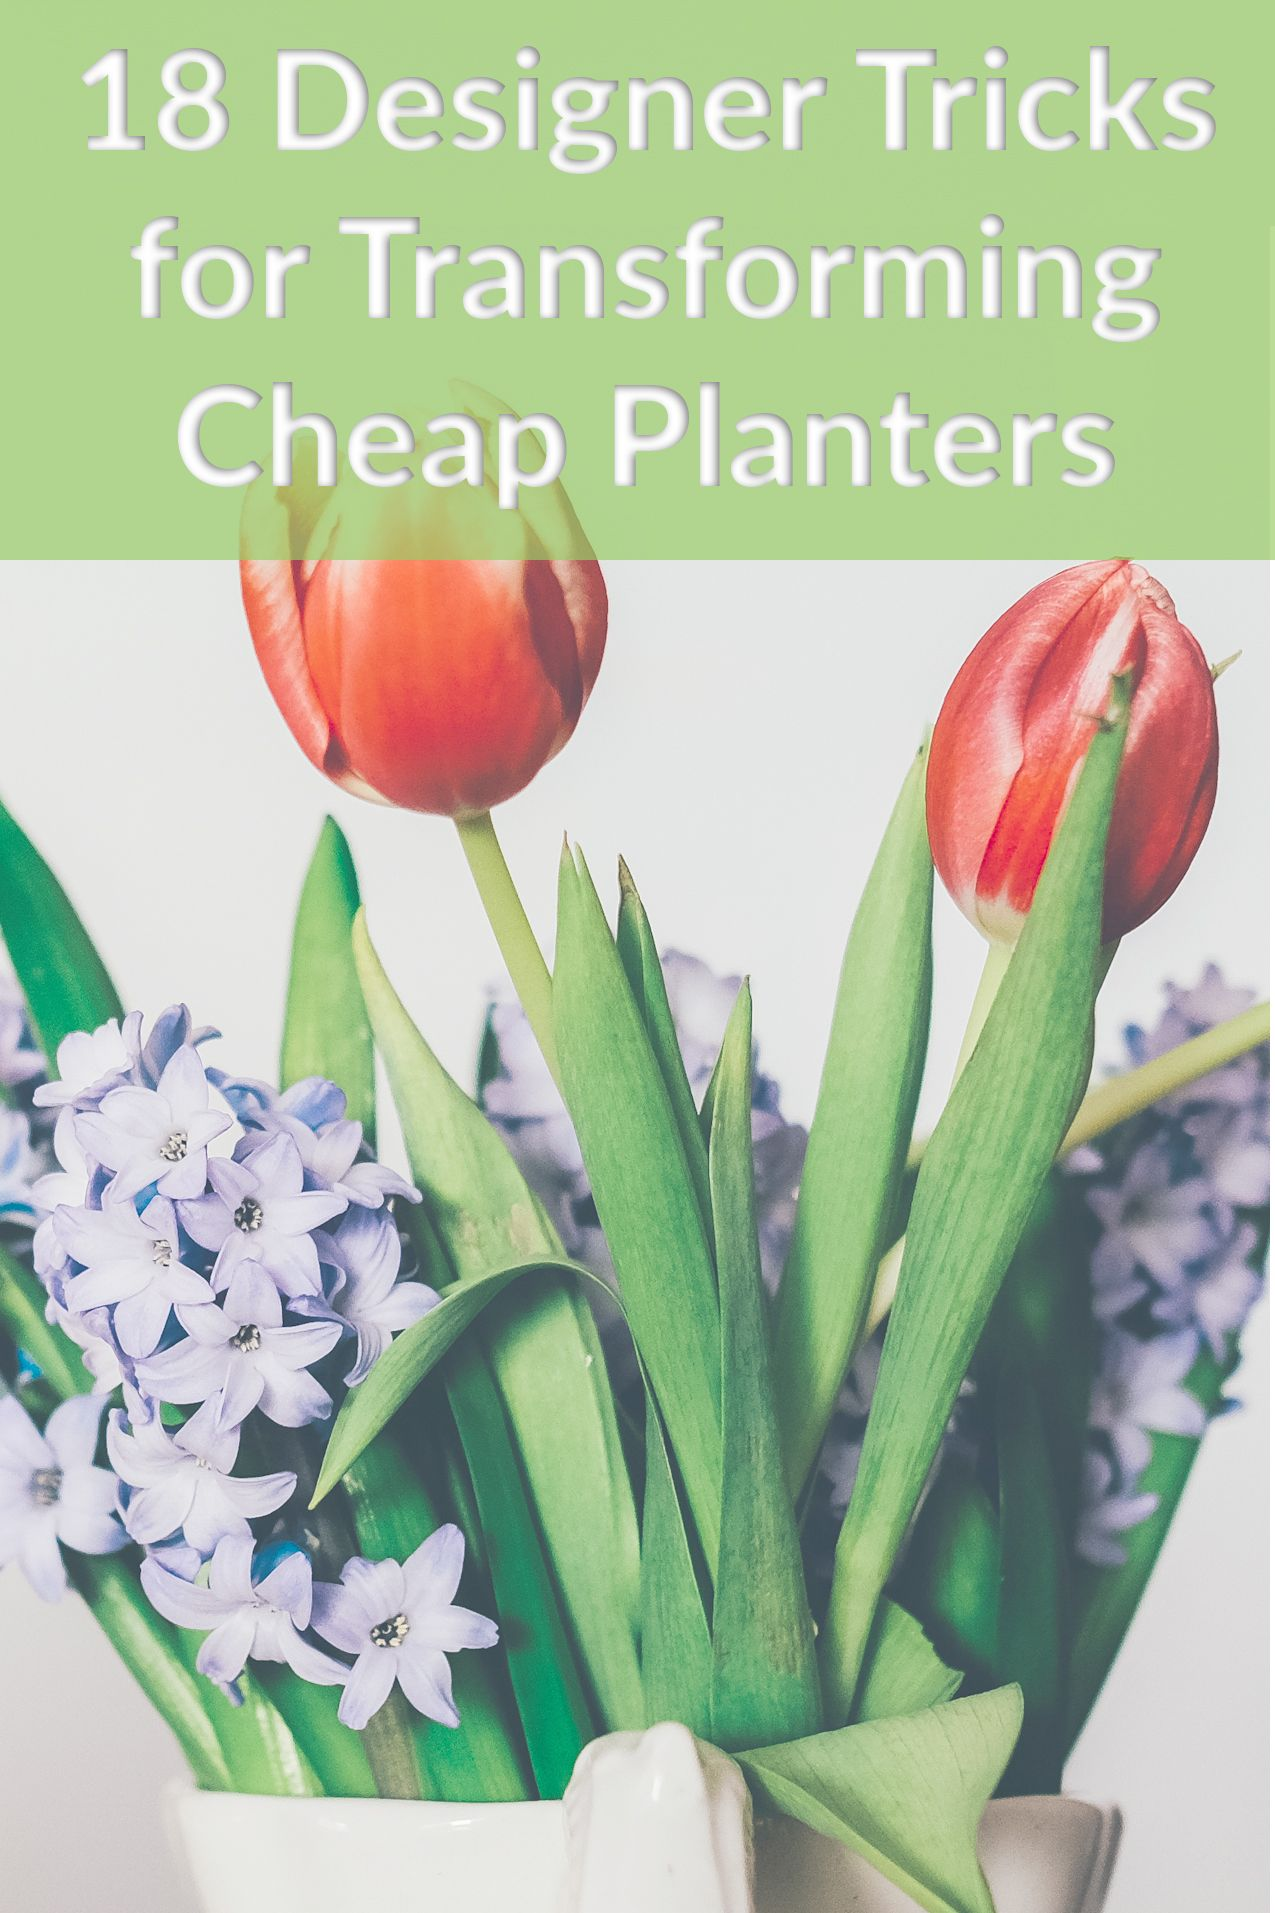 18 Creative Tricks for Gorgeous Designer Planters